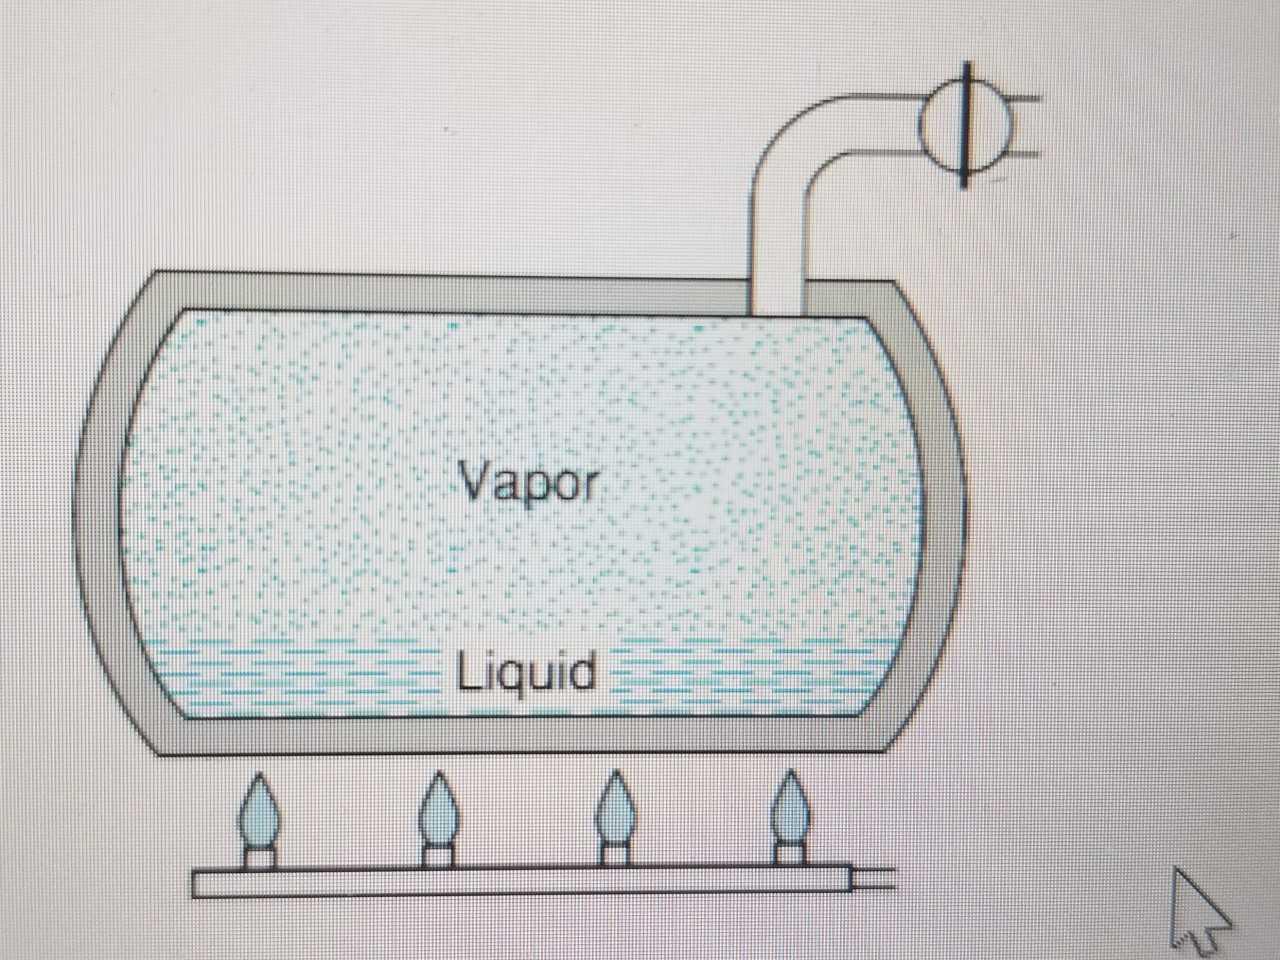 Vapor Liquid